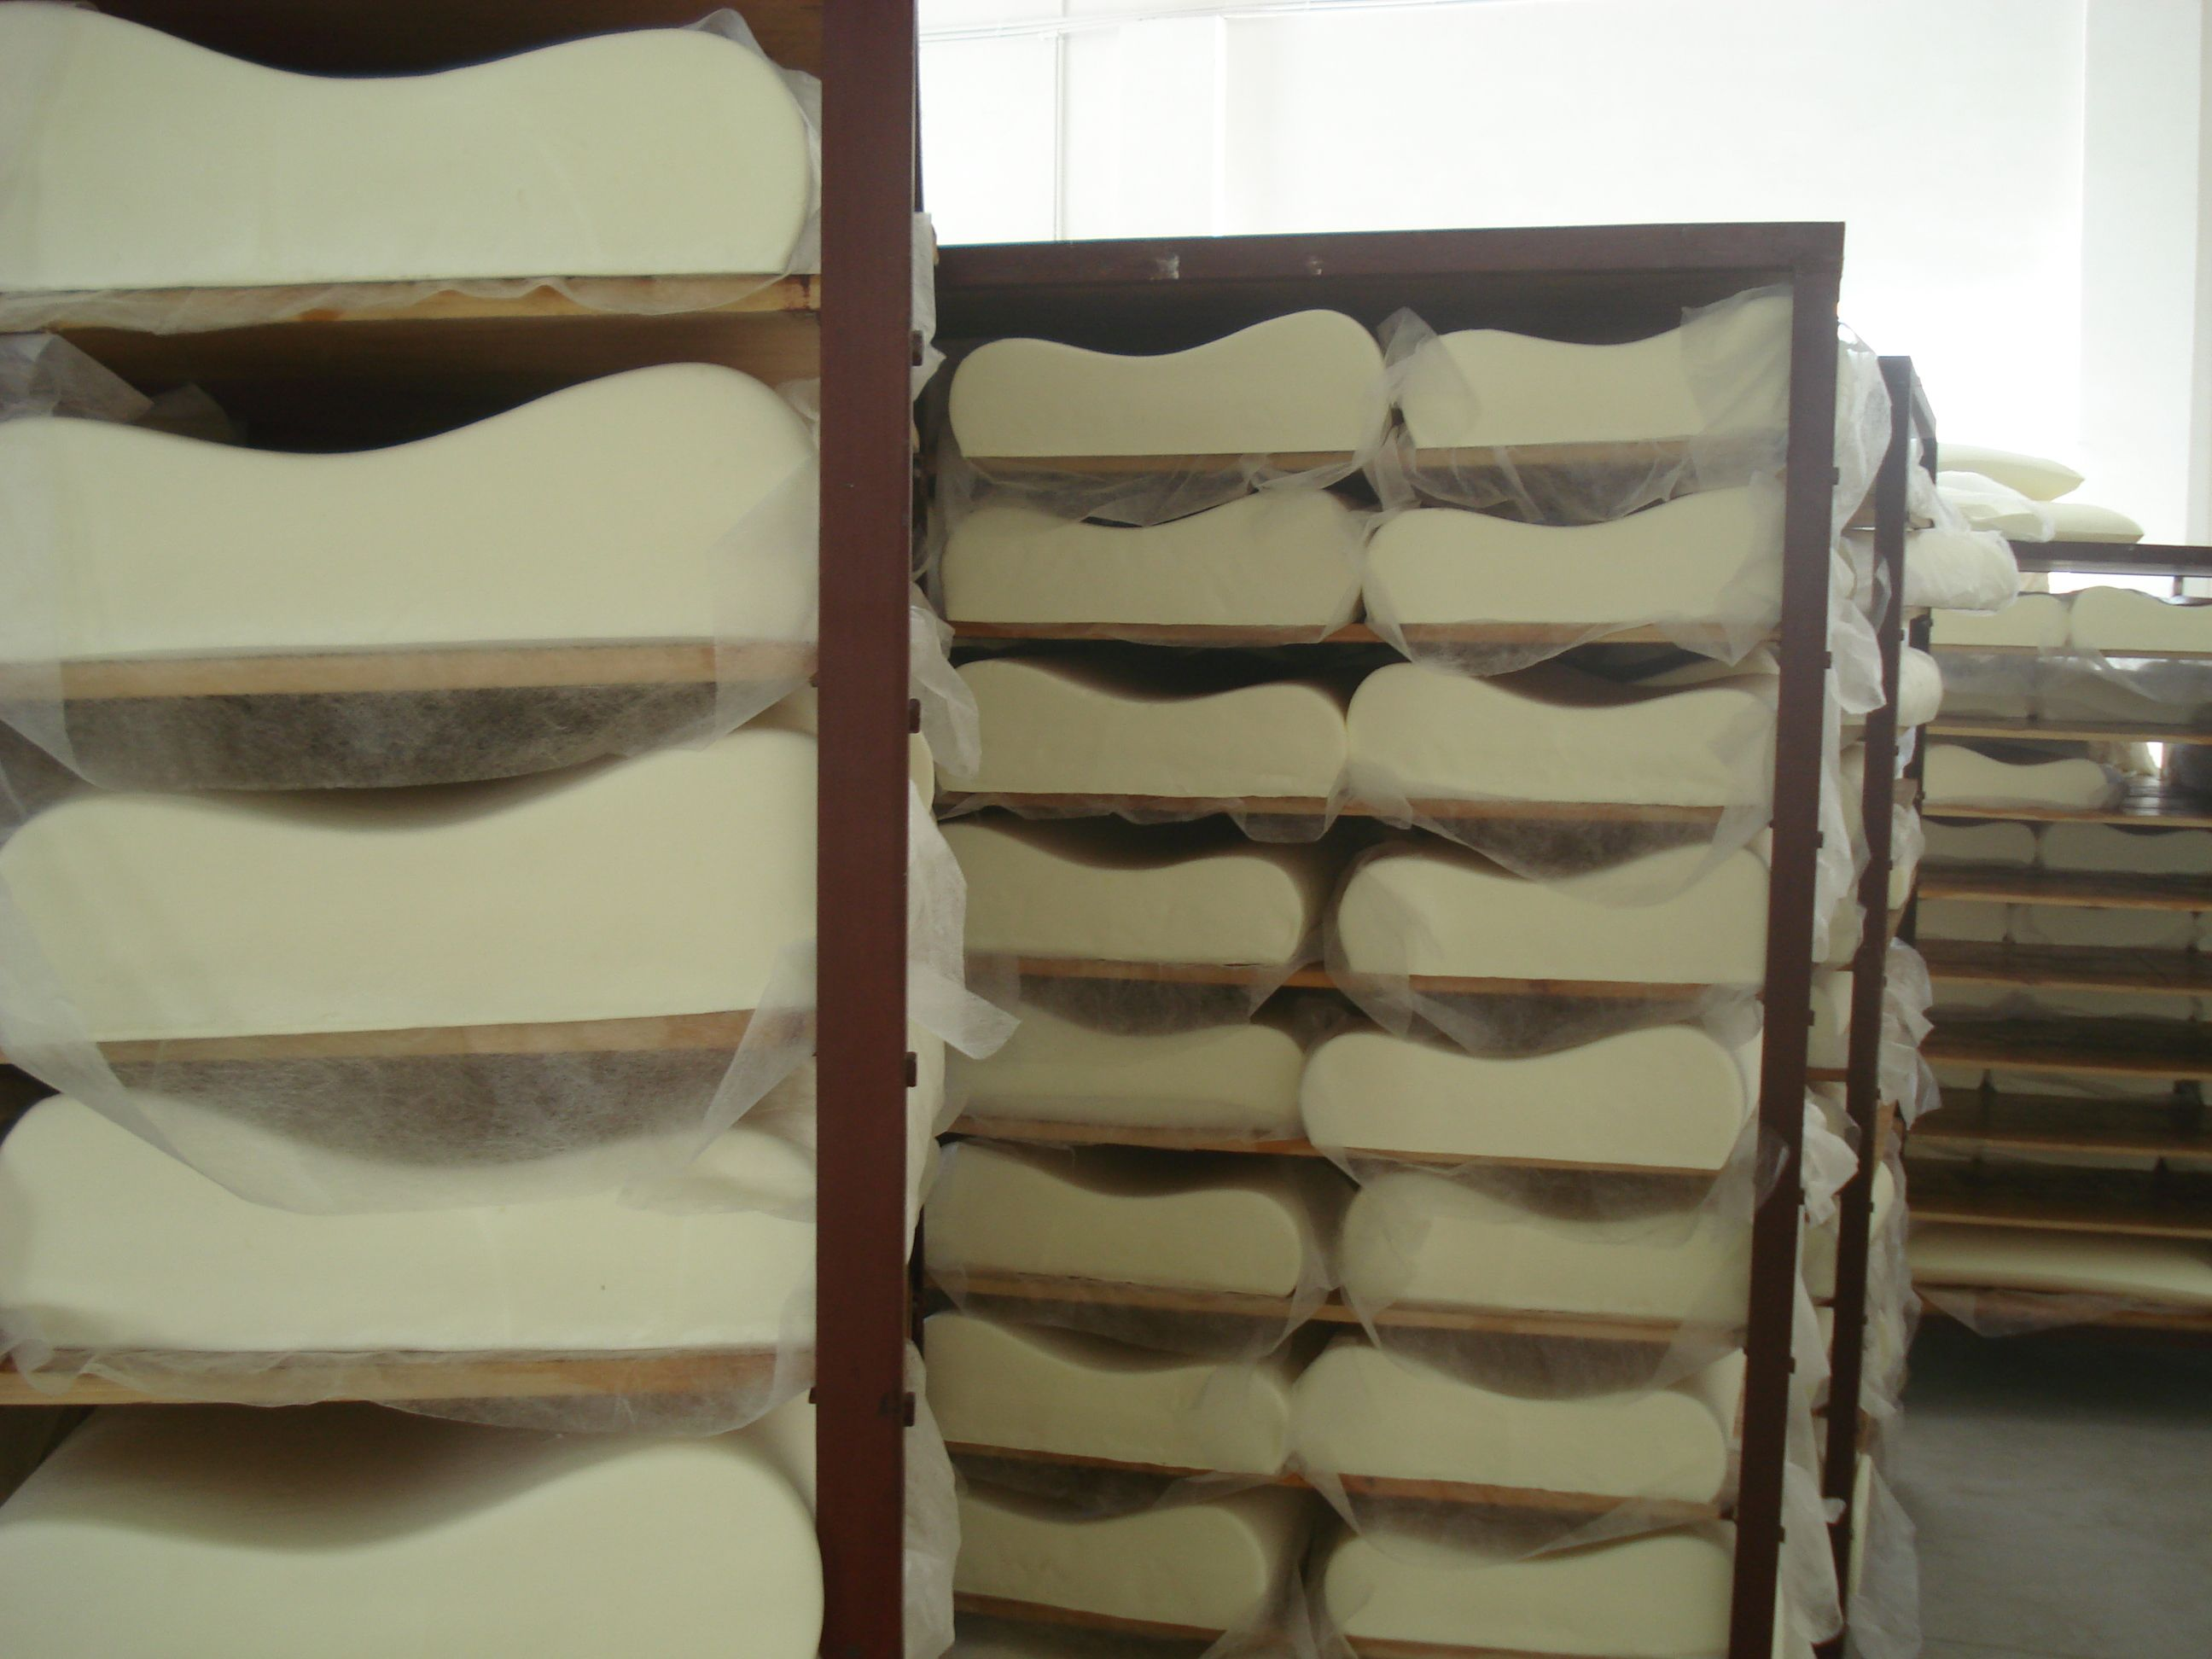 Nature's Sleep Memory Foam Pillows Settling on the Bread Racks #naturessleep #sleepnation